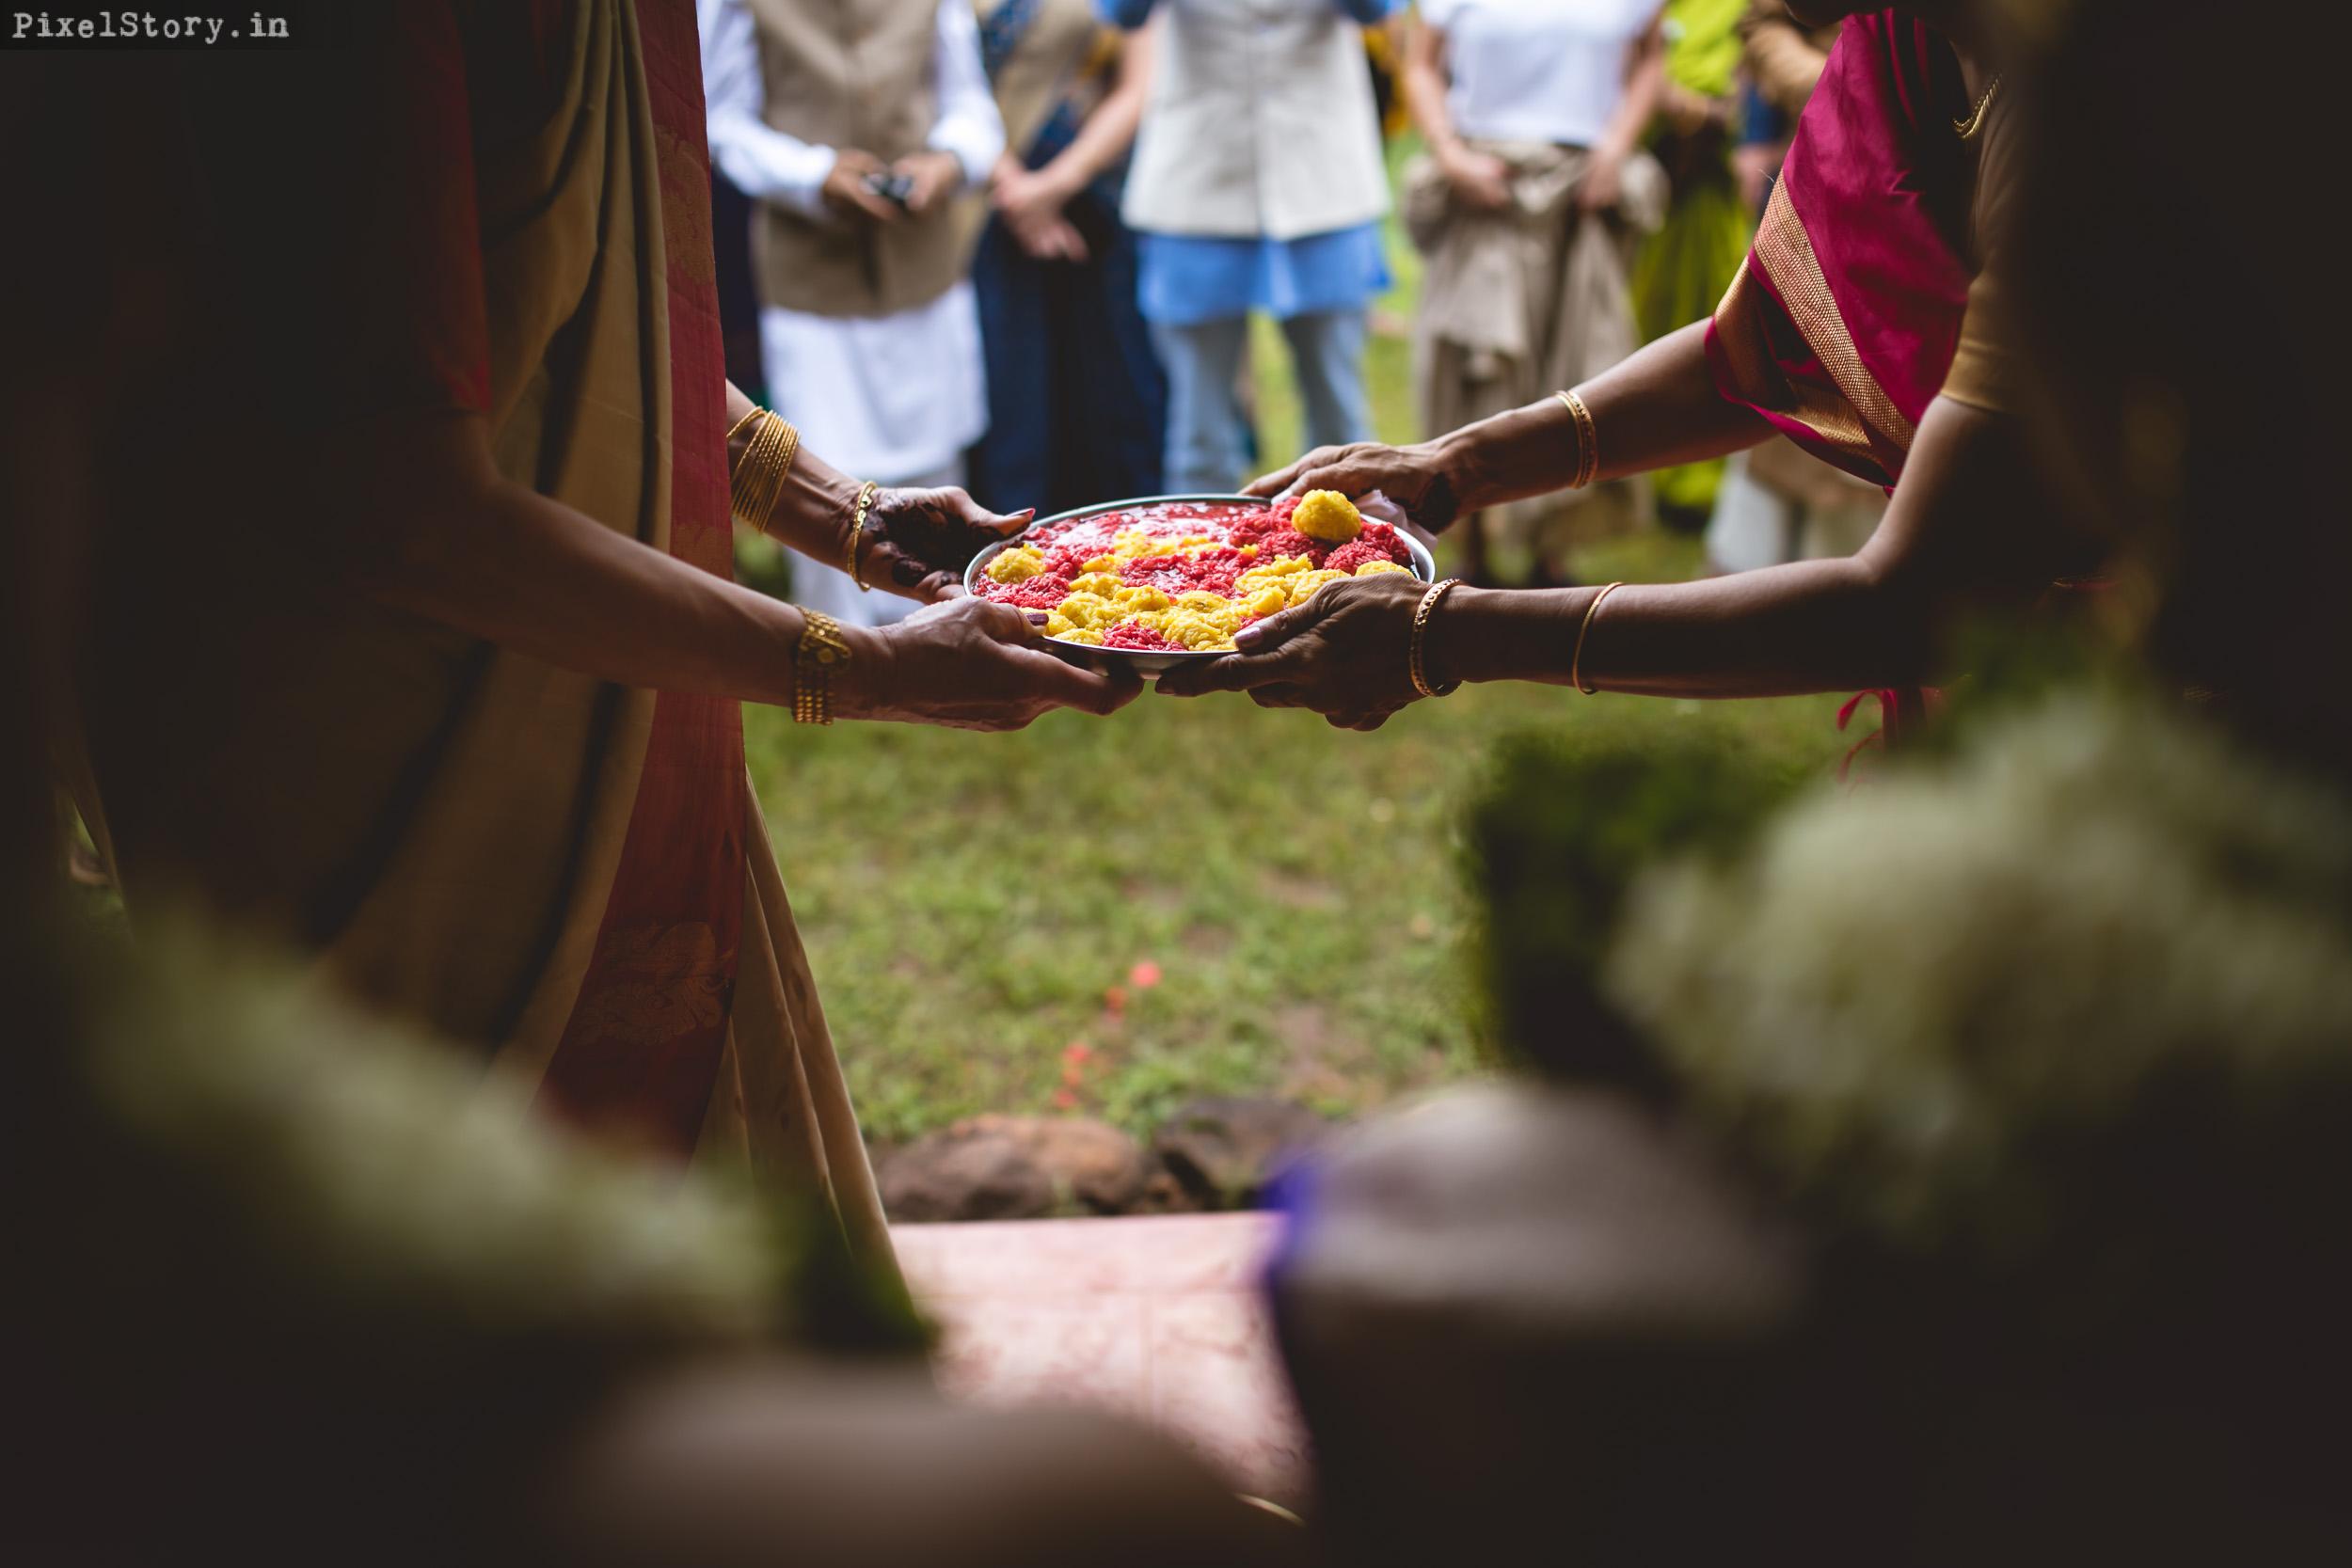 PixelStory-Jungle-Wedding-Photographer-Masinagudi-Indo-French046.jpg